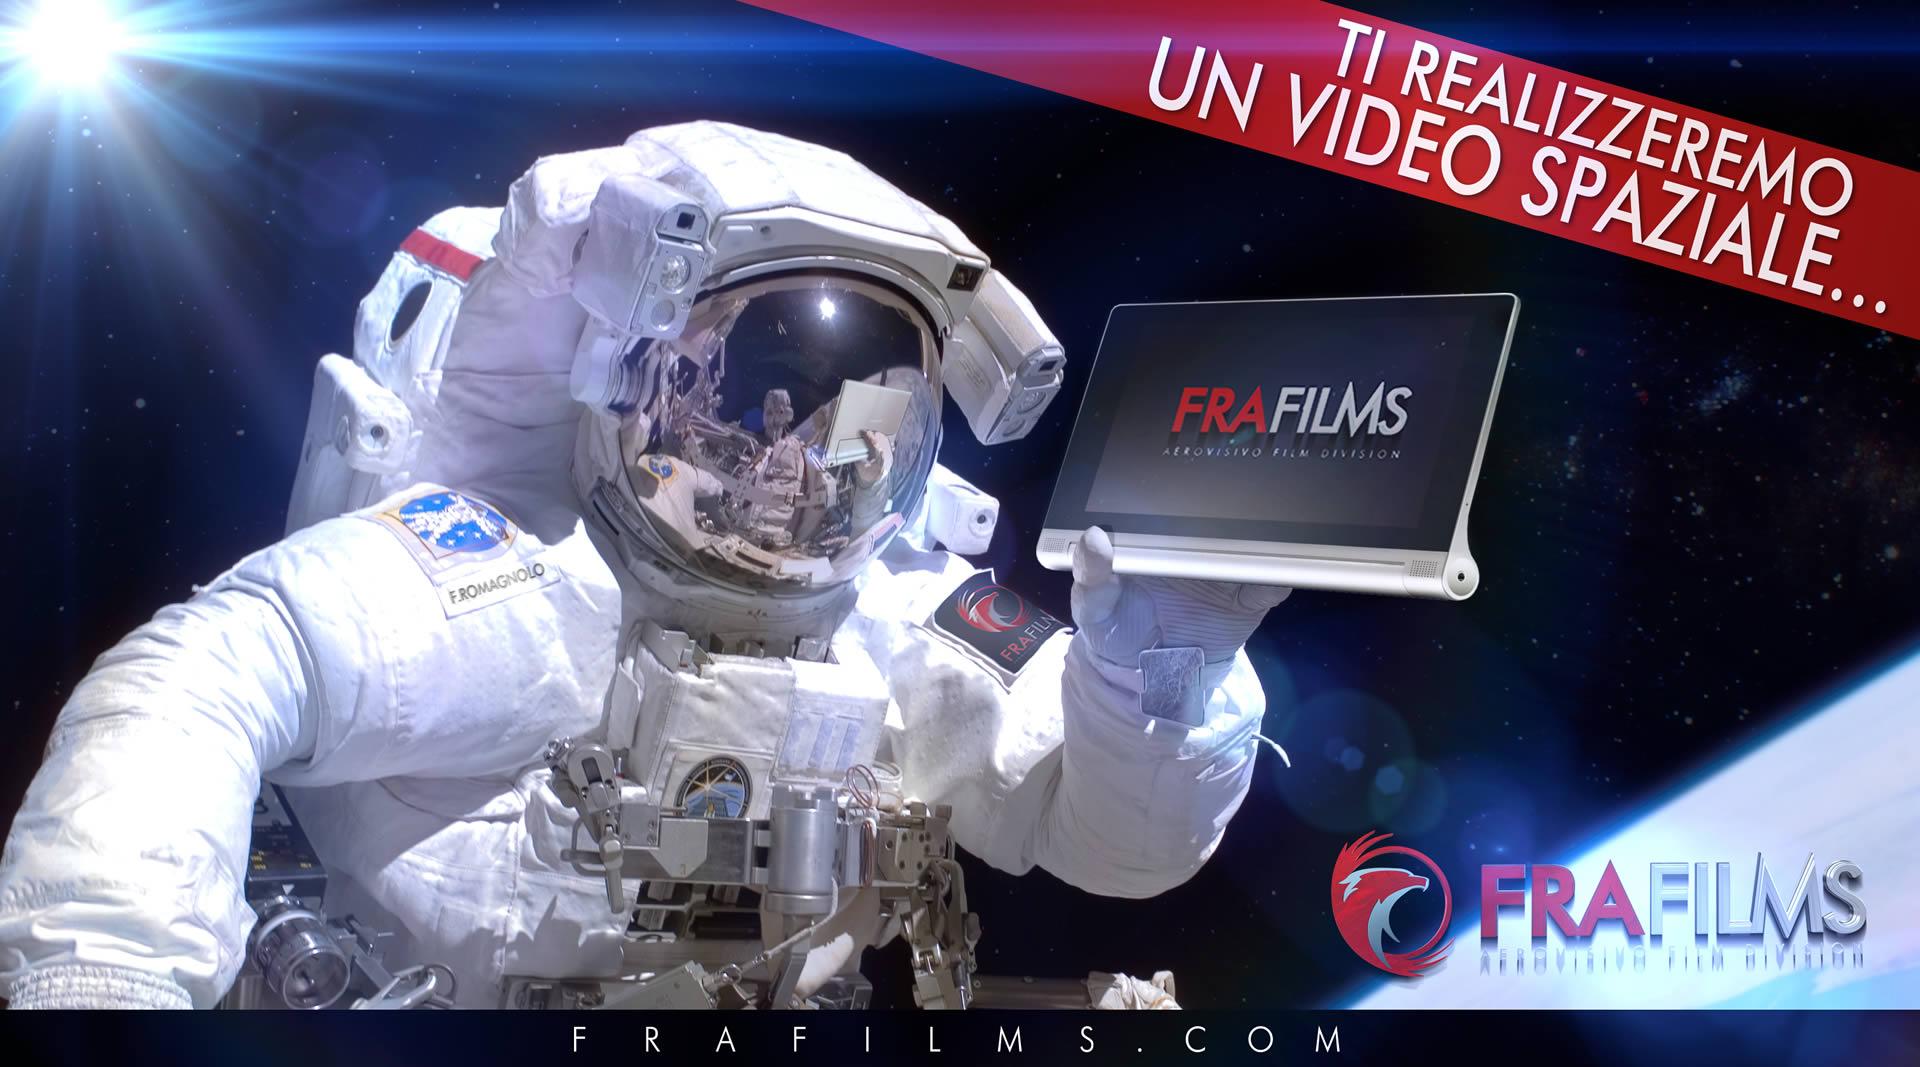 video spazialelow